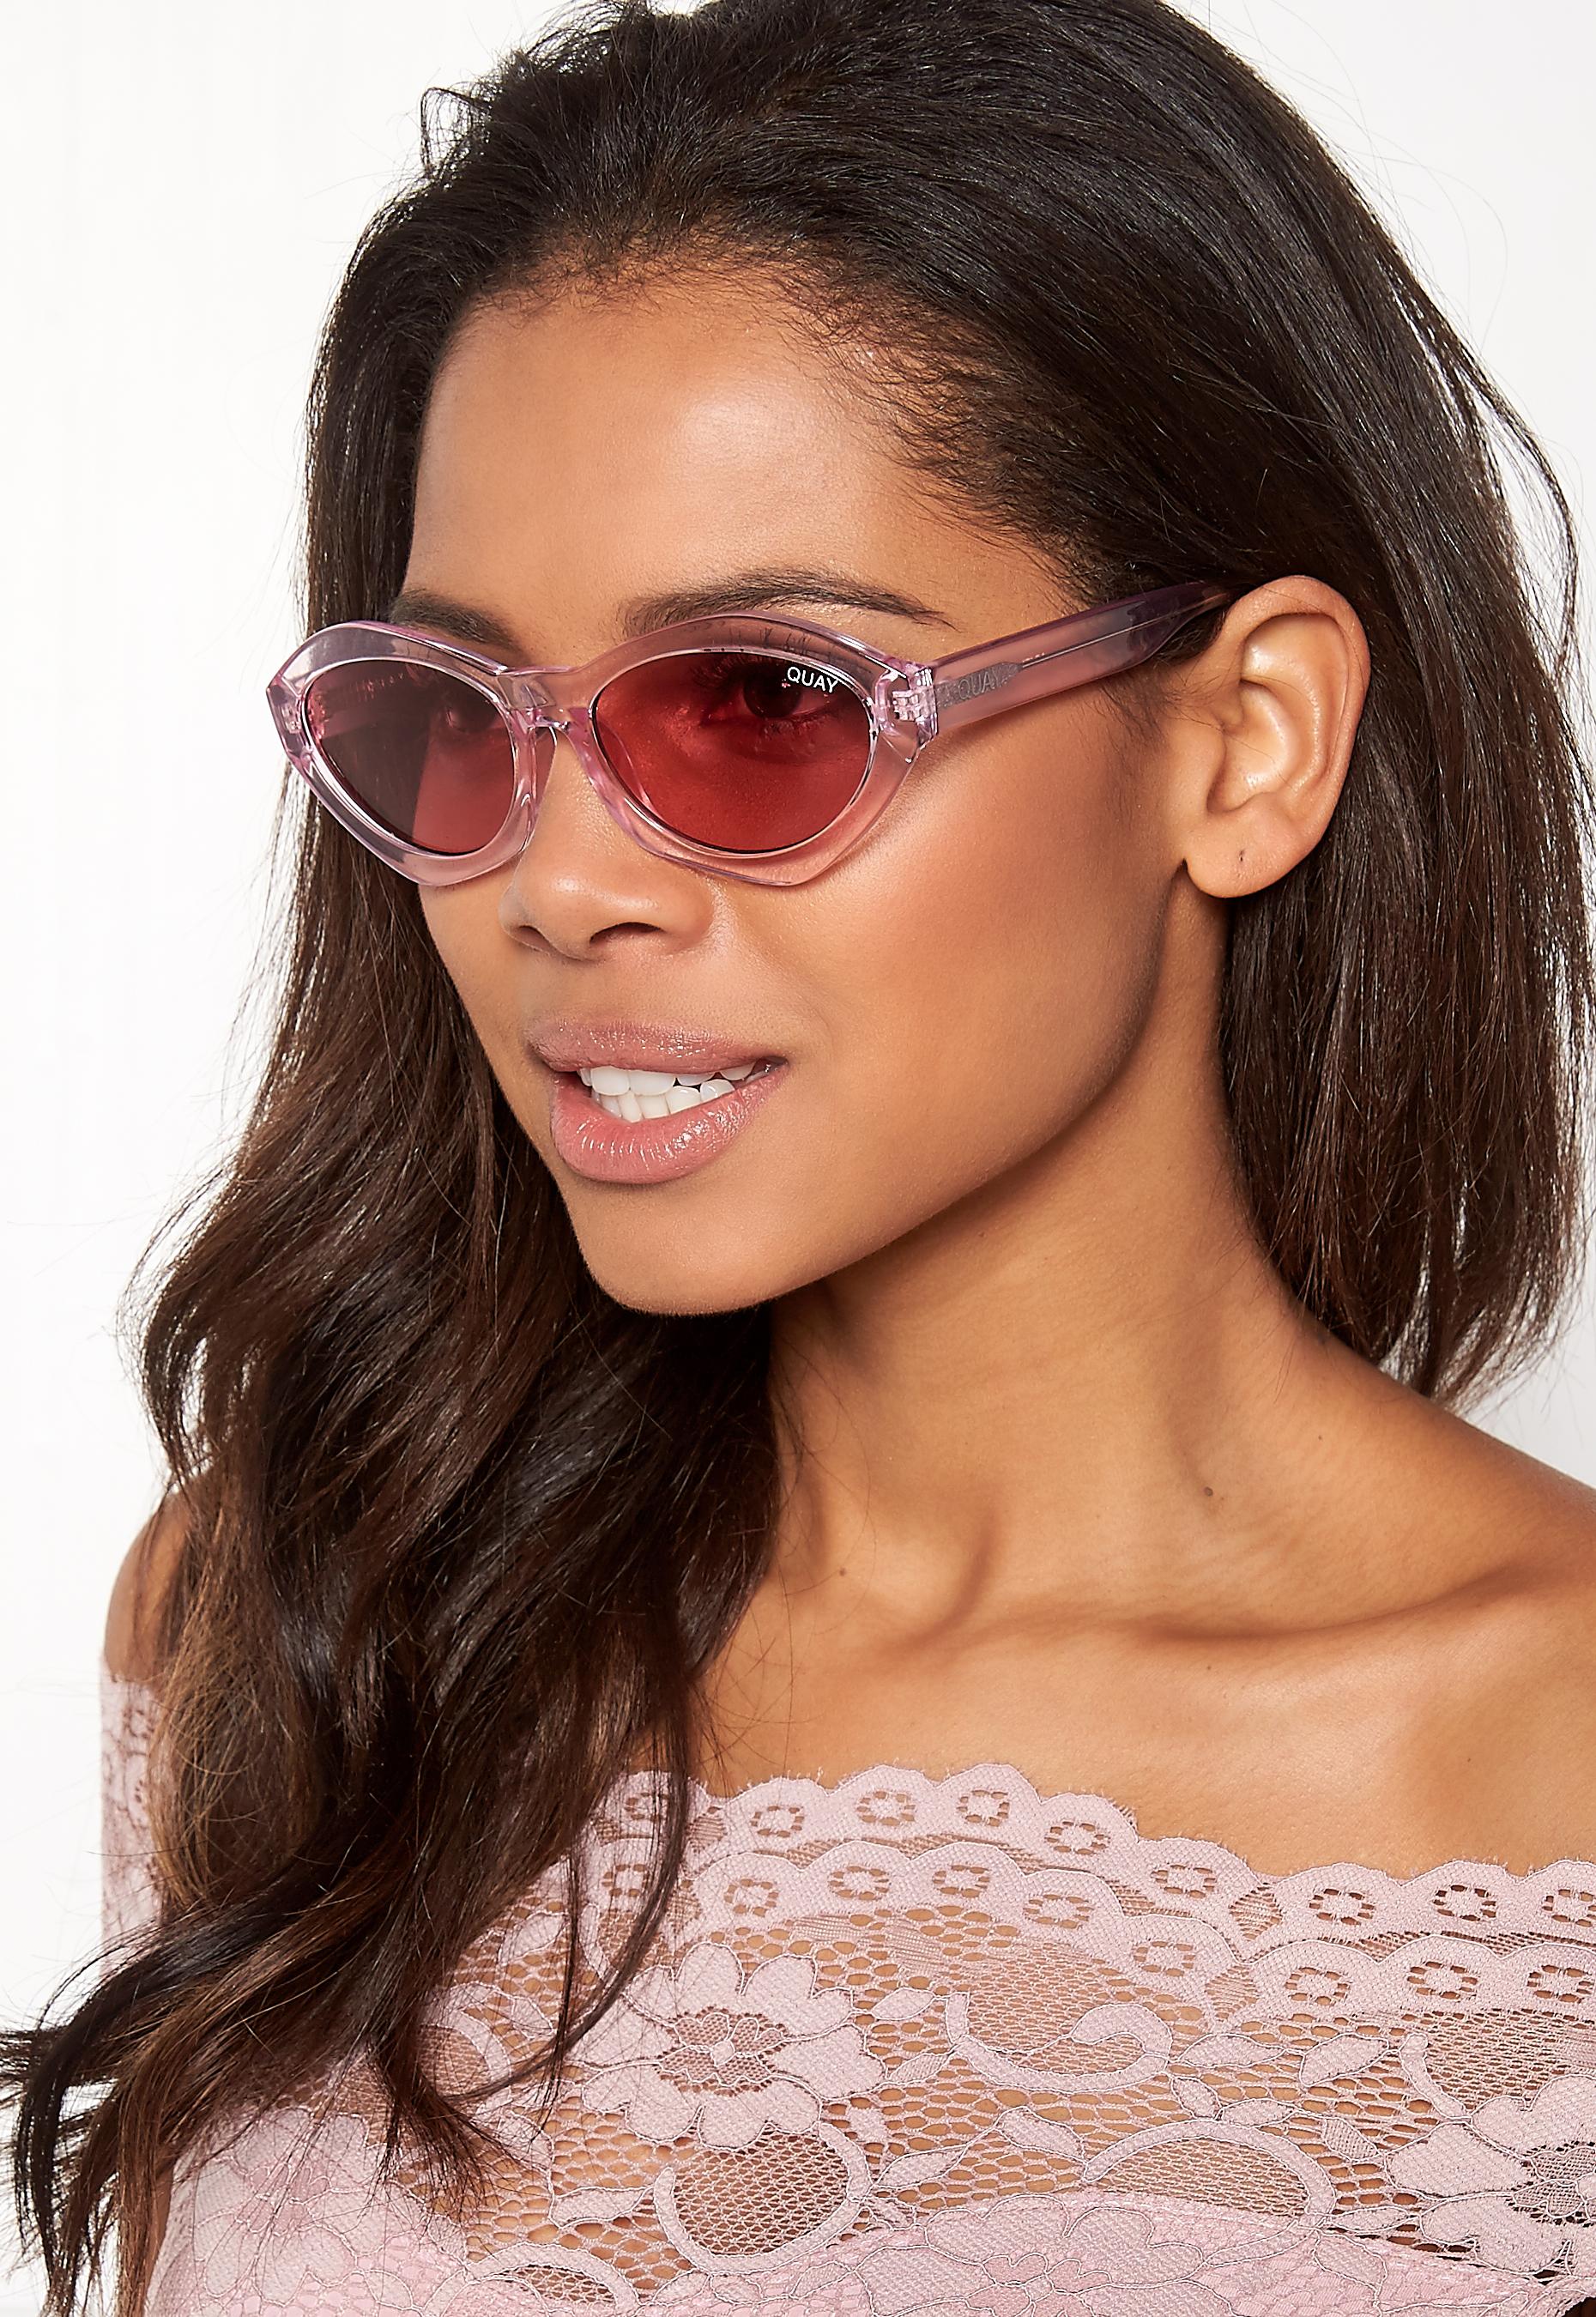 109997f1f3 Quay Australia As If Sunglasses Pink   Pink Lens - Bubbleroom